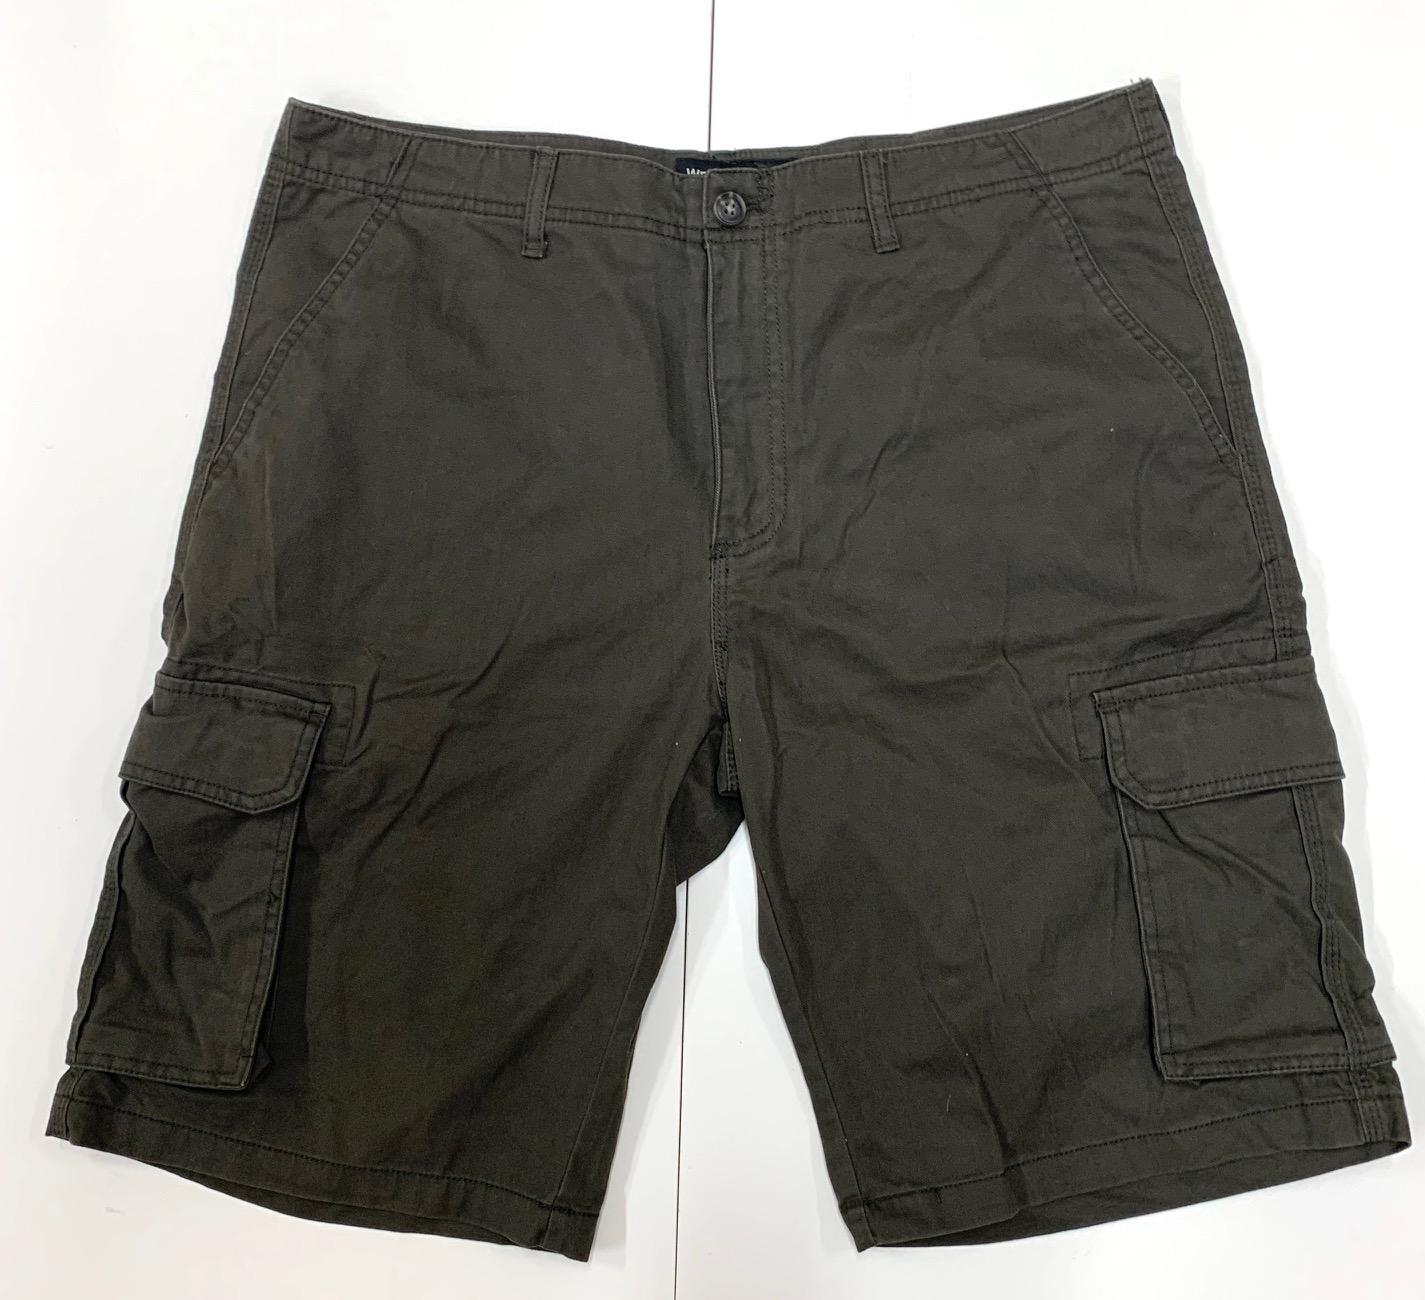 Крутые мужские шорты от Weatherproof